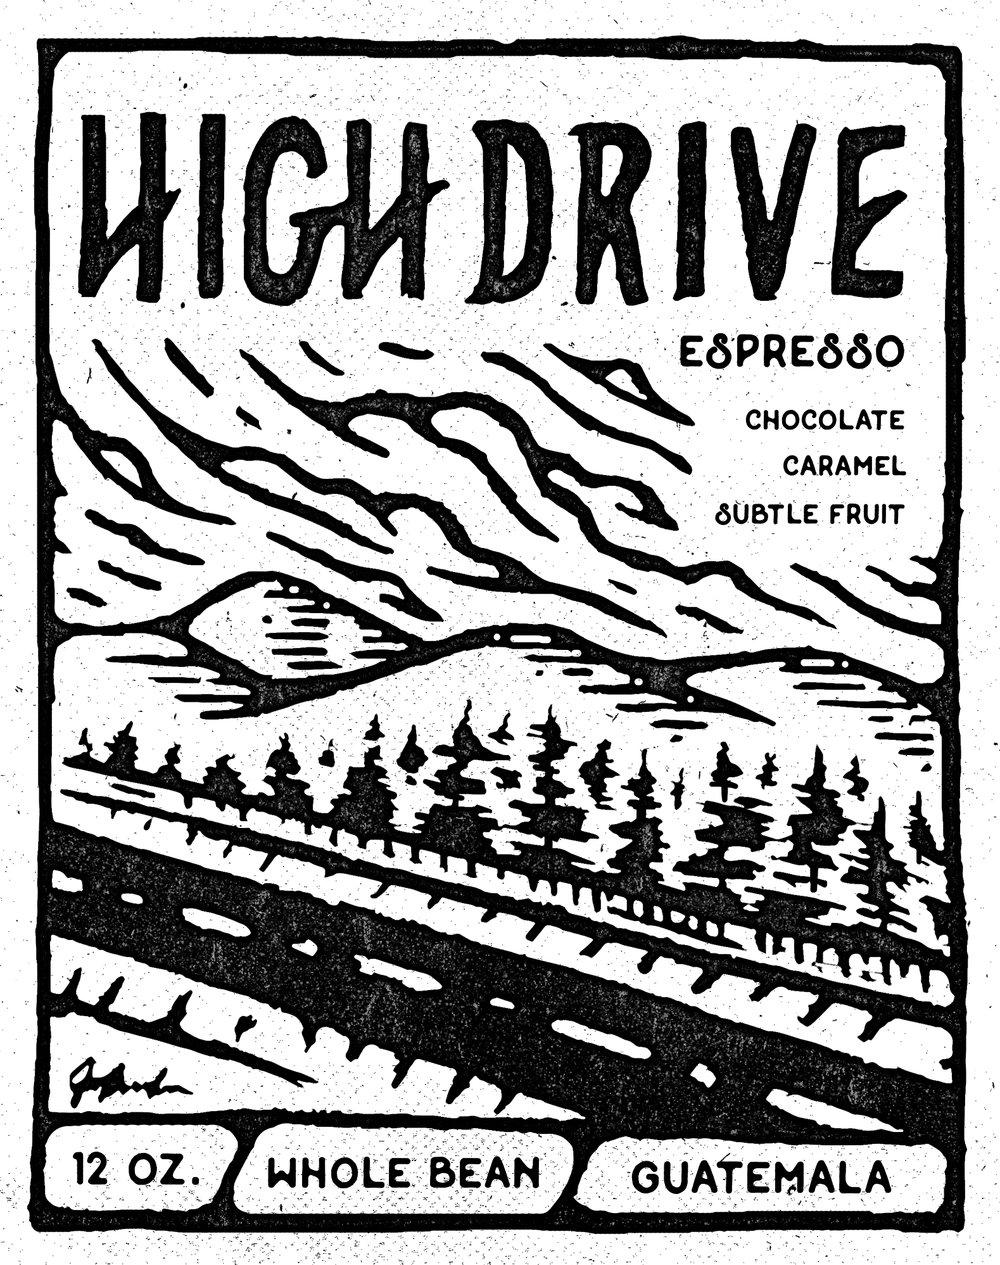 High Drive Label.jpg